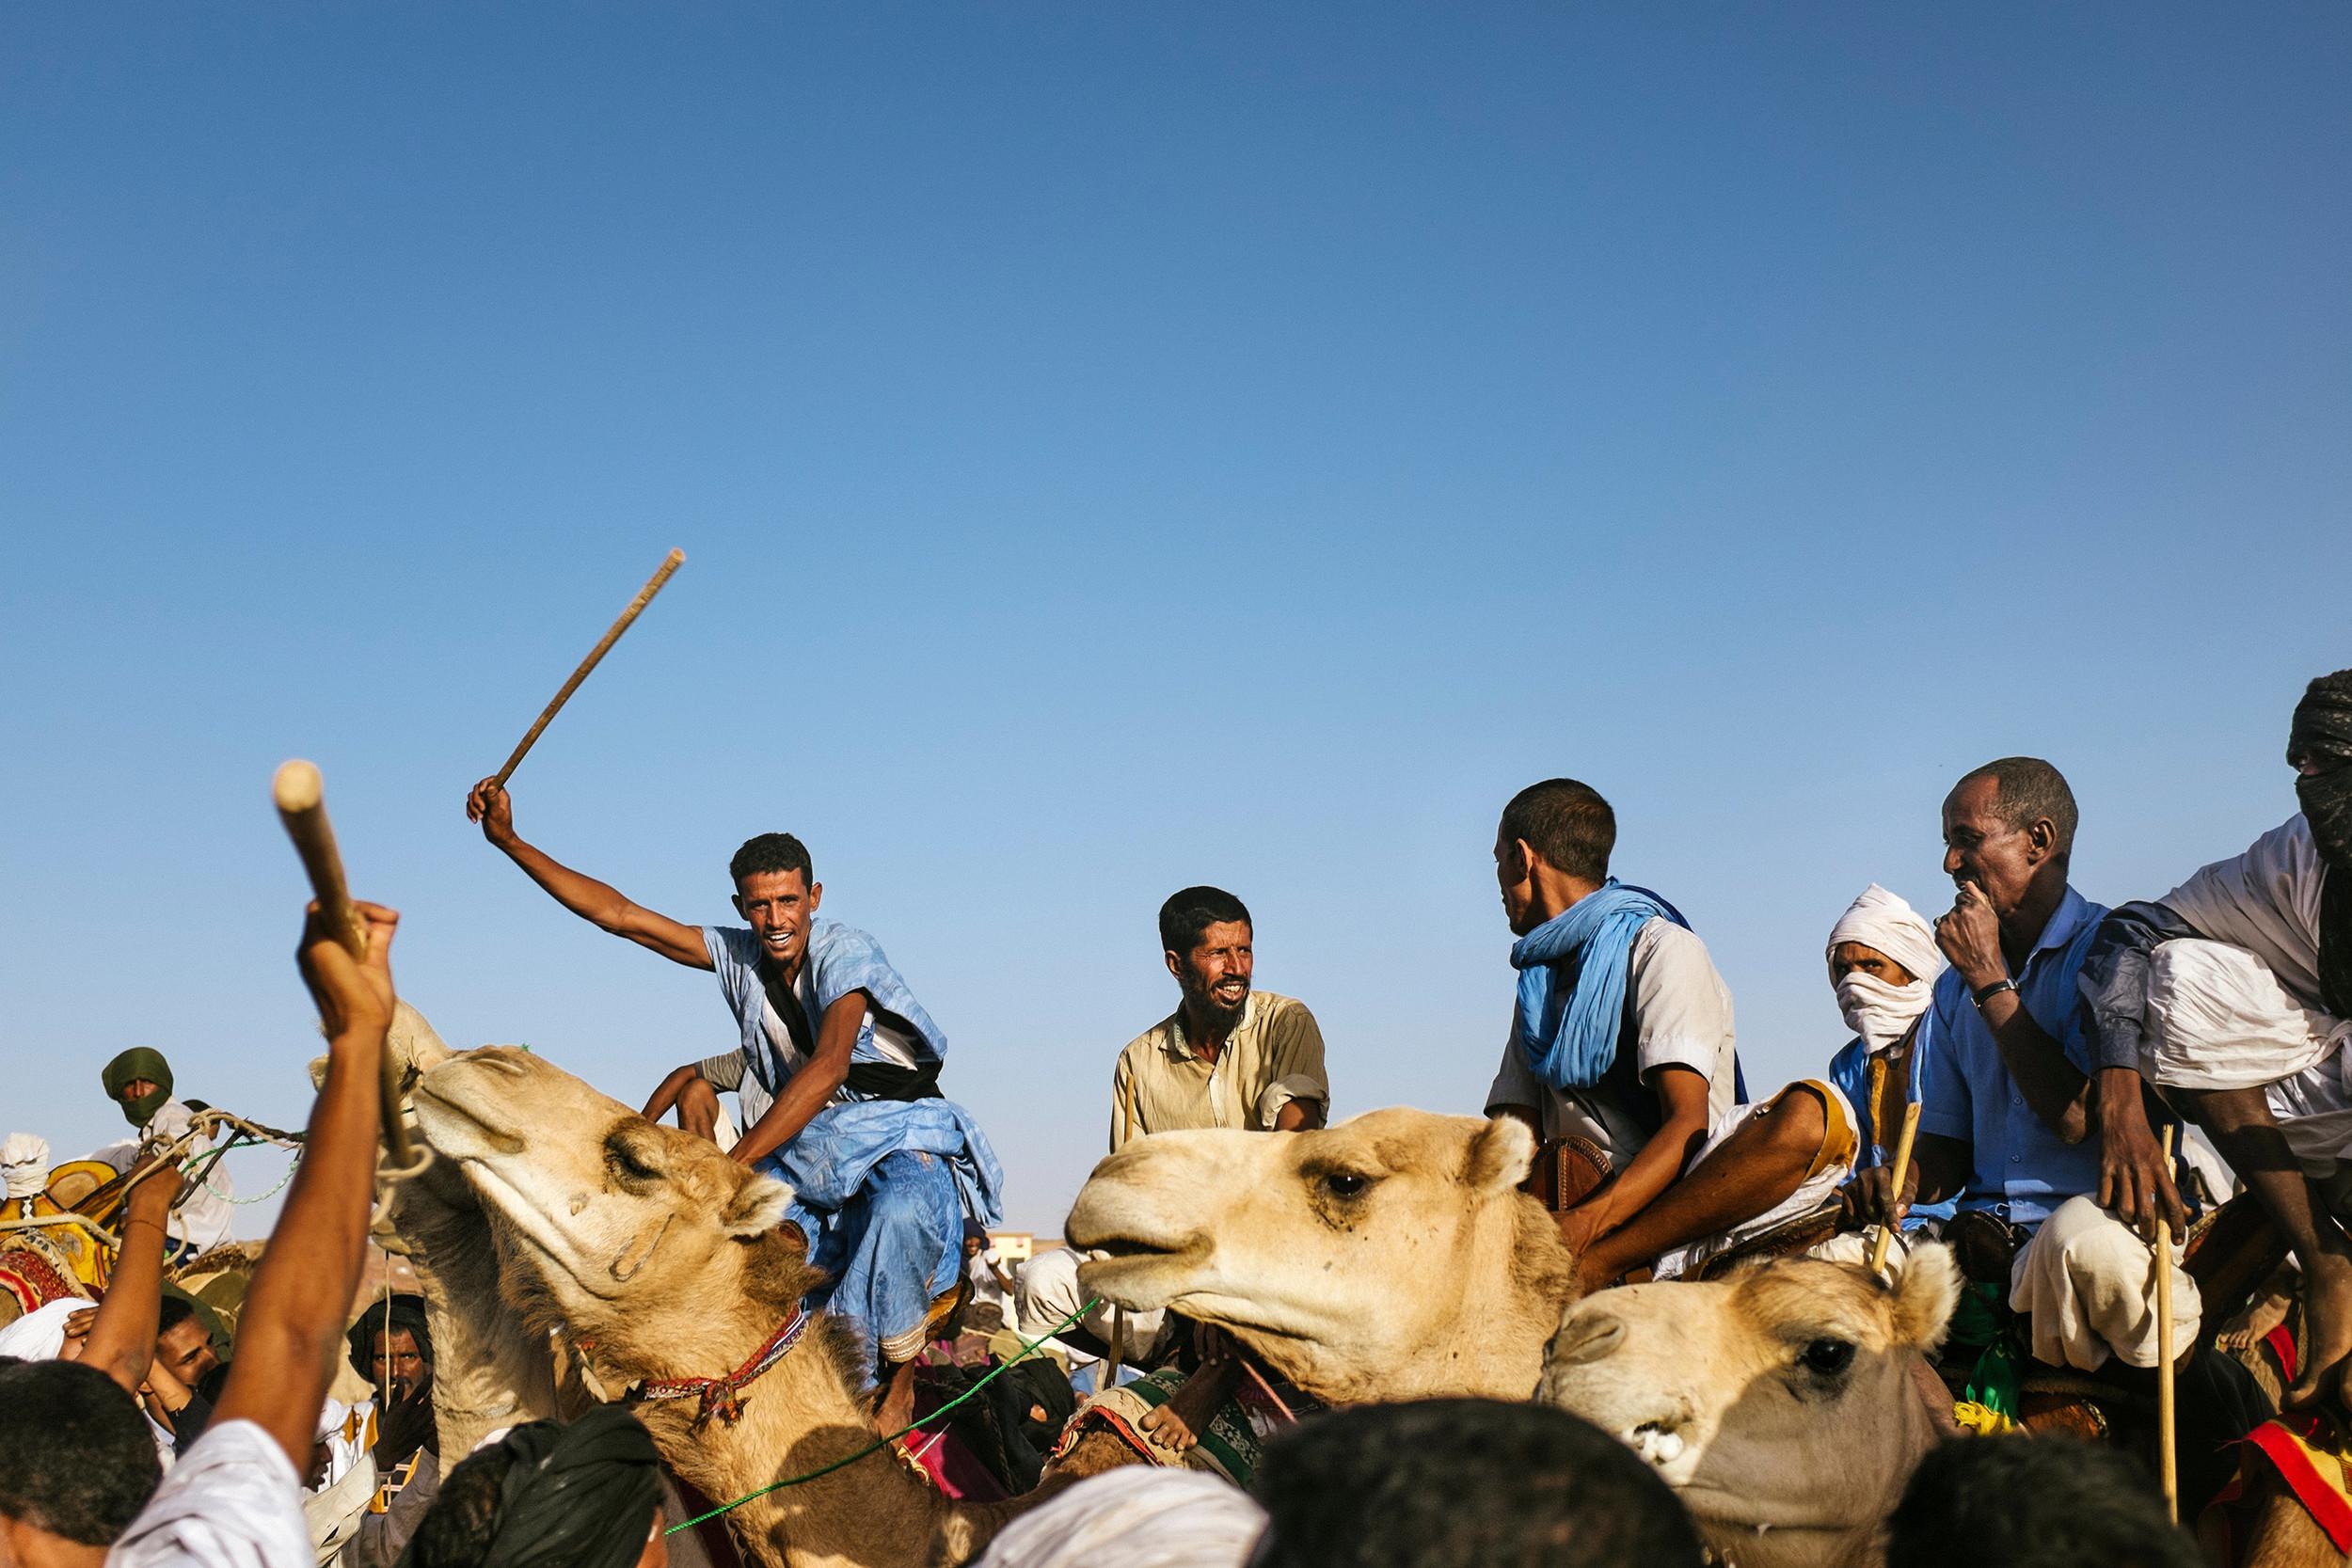 Camel race winner circle